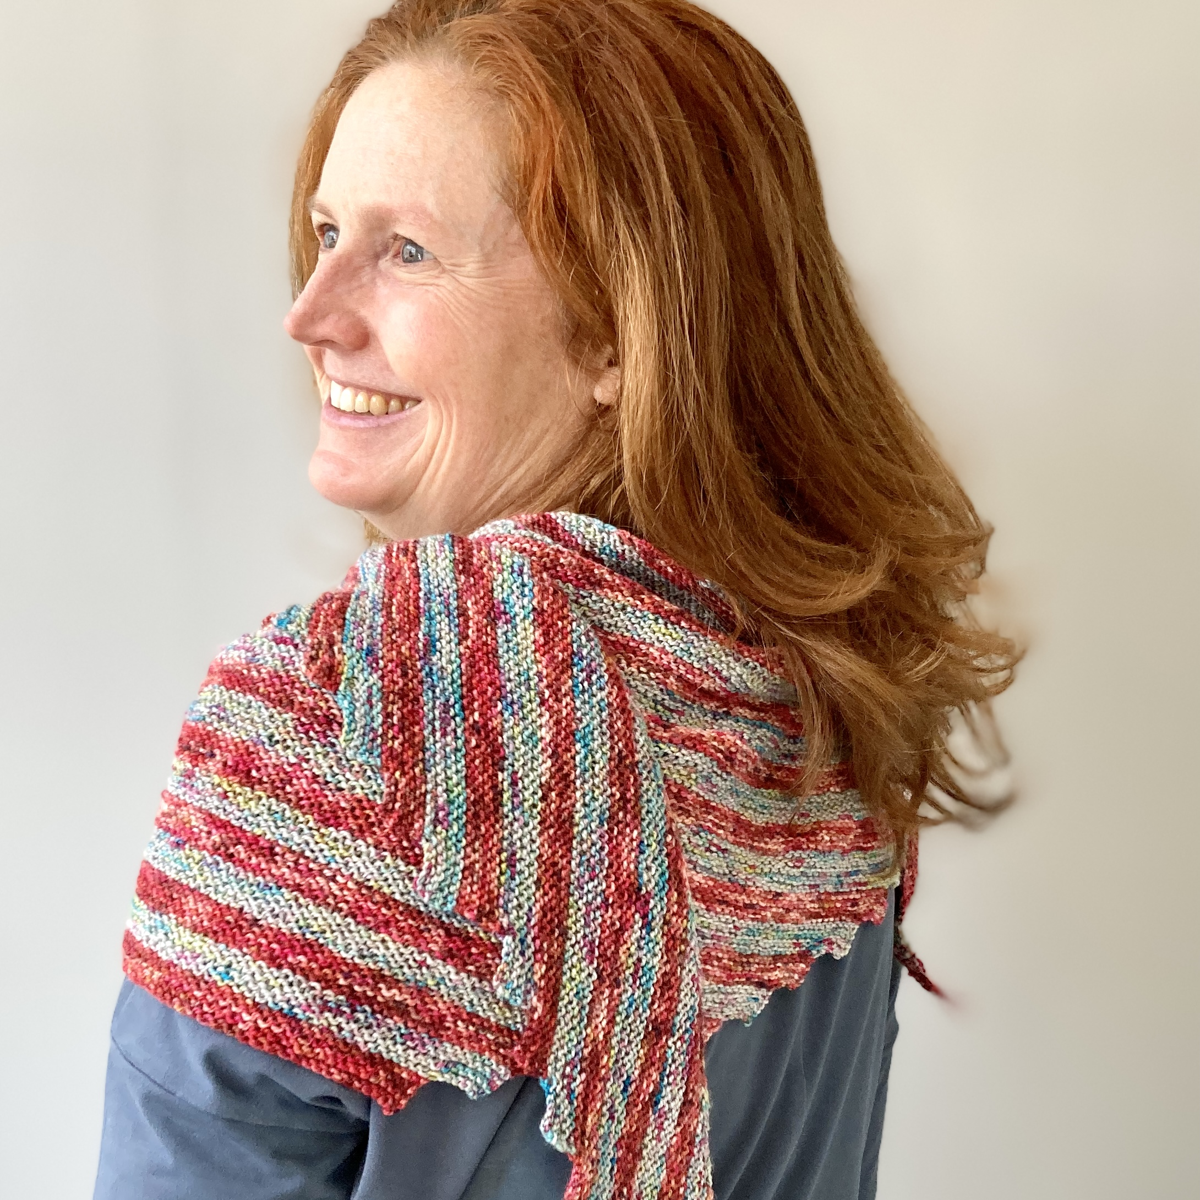 Hitchiker knit shawl by Cowgirlblues in Merino Twist